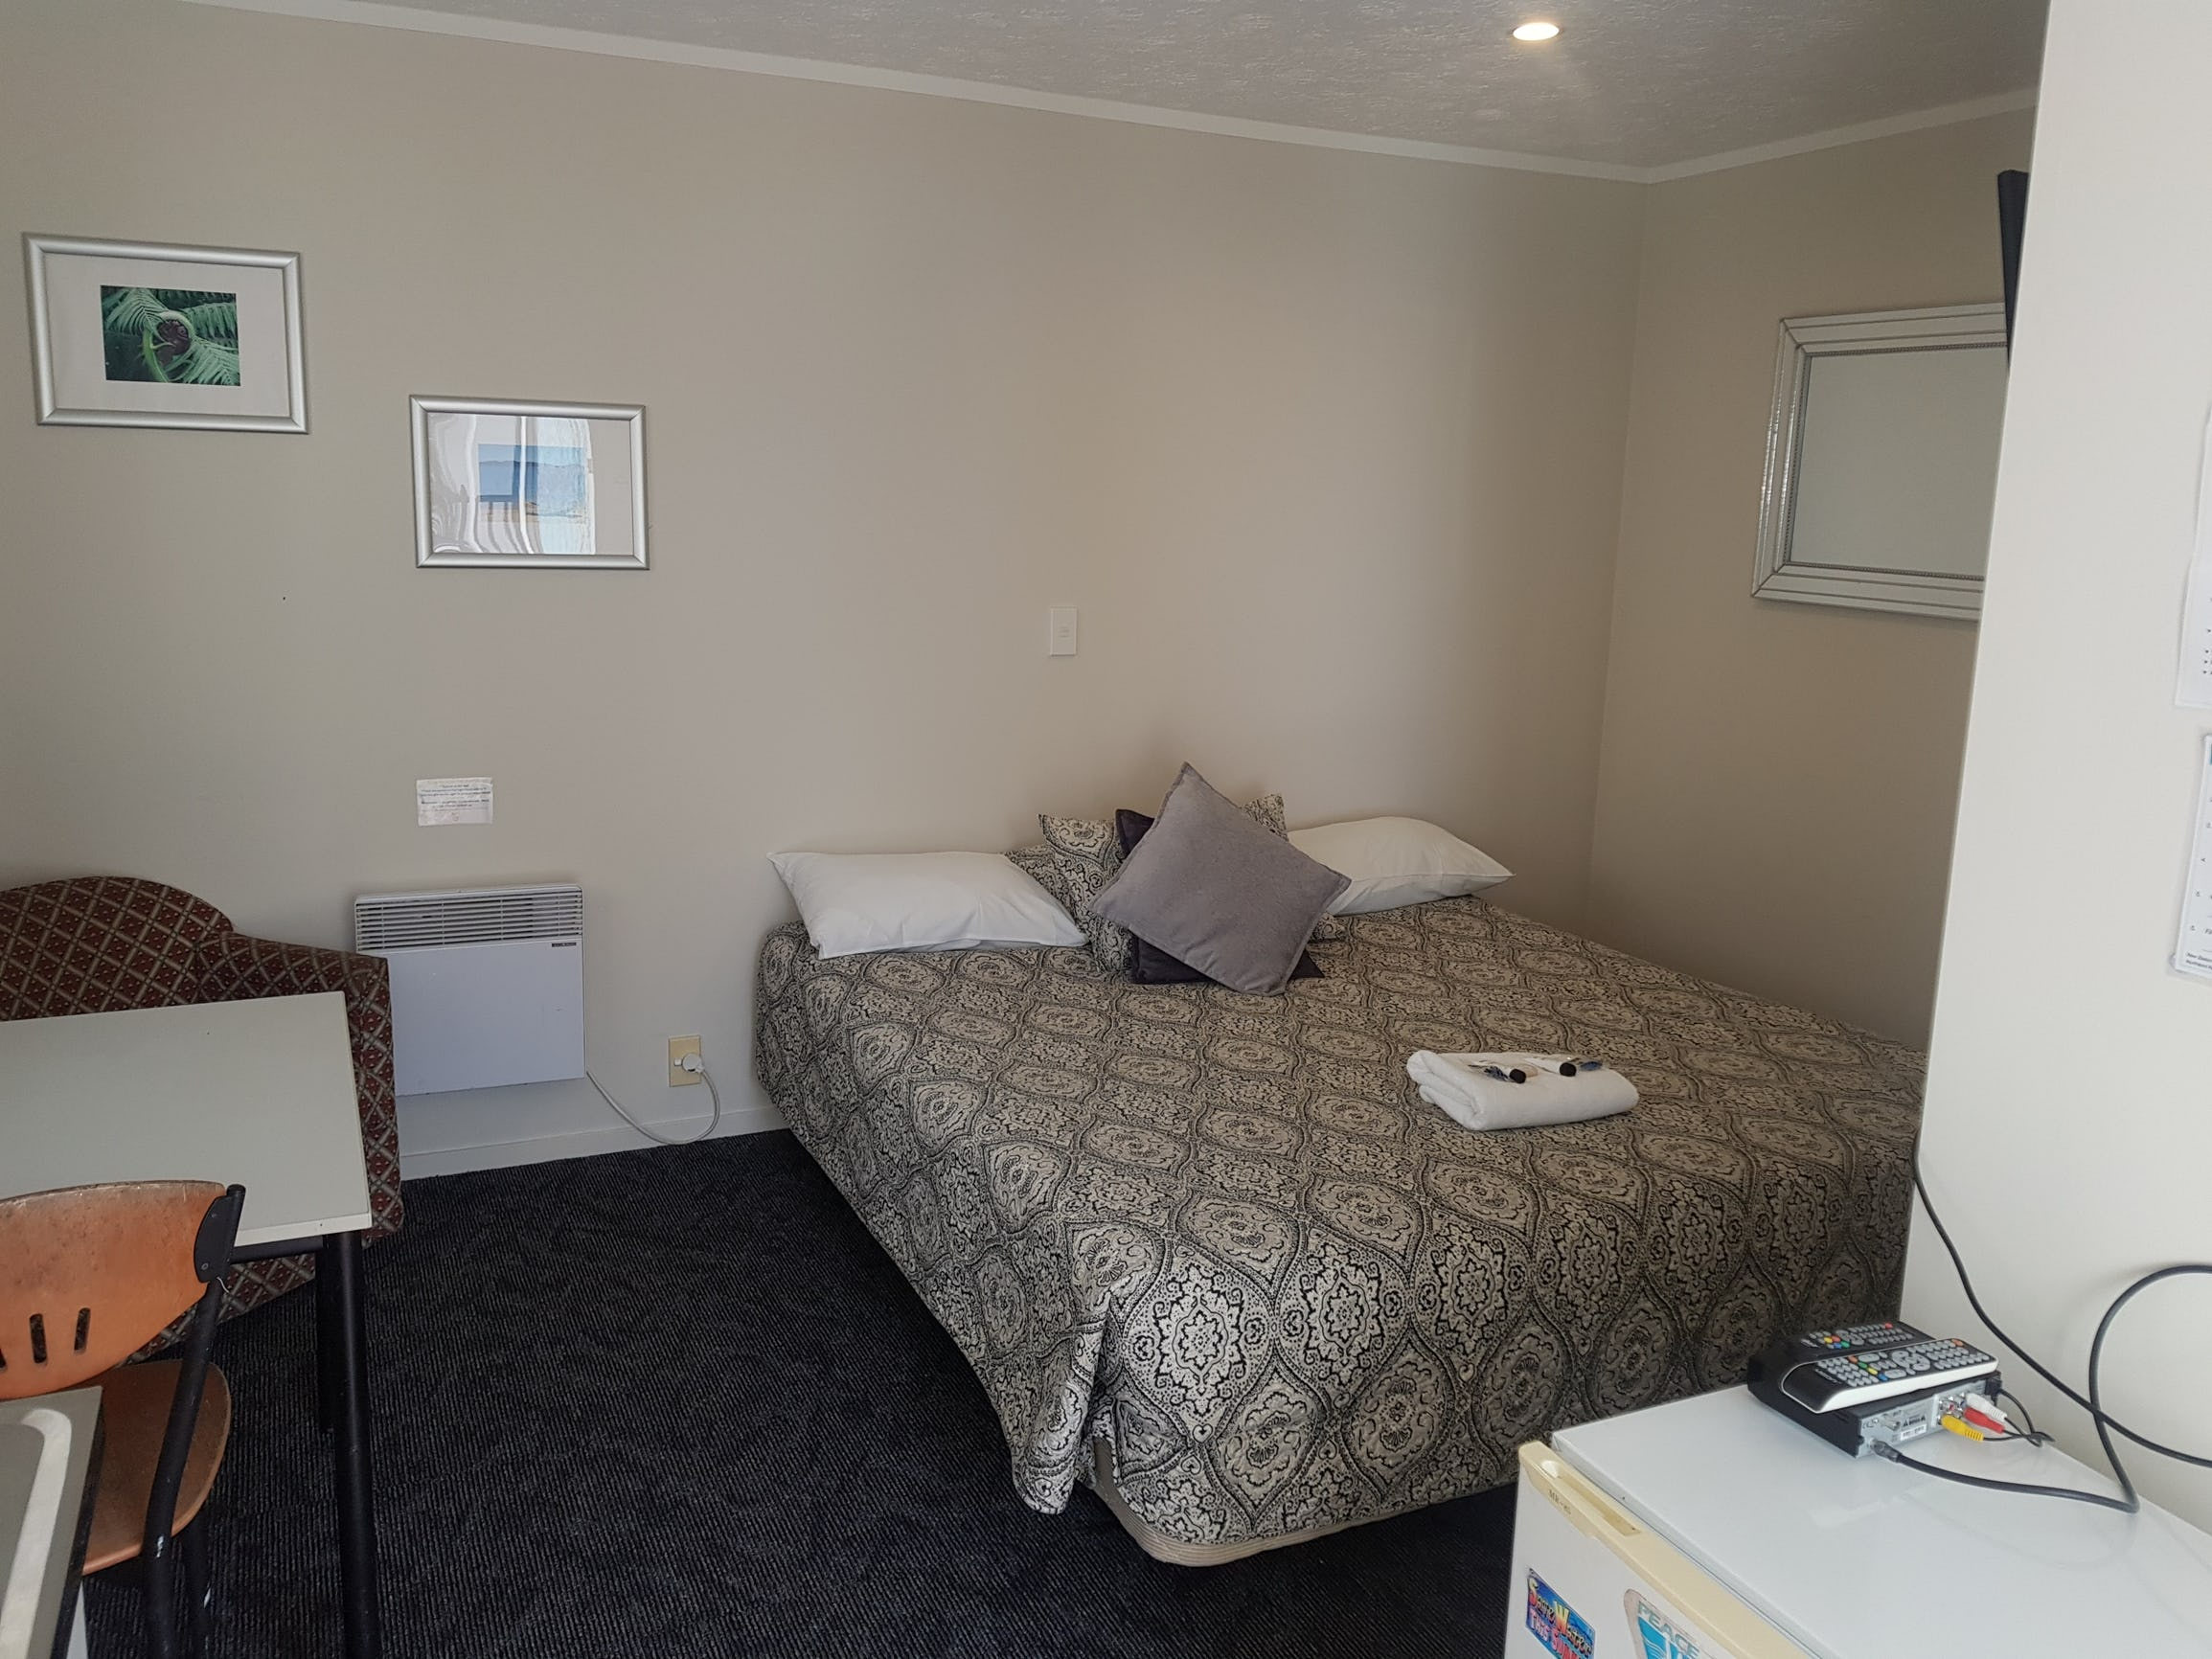 Base派希亚背包客旅馆的私人双人大床房套件